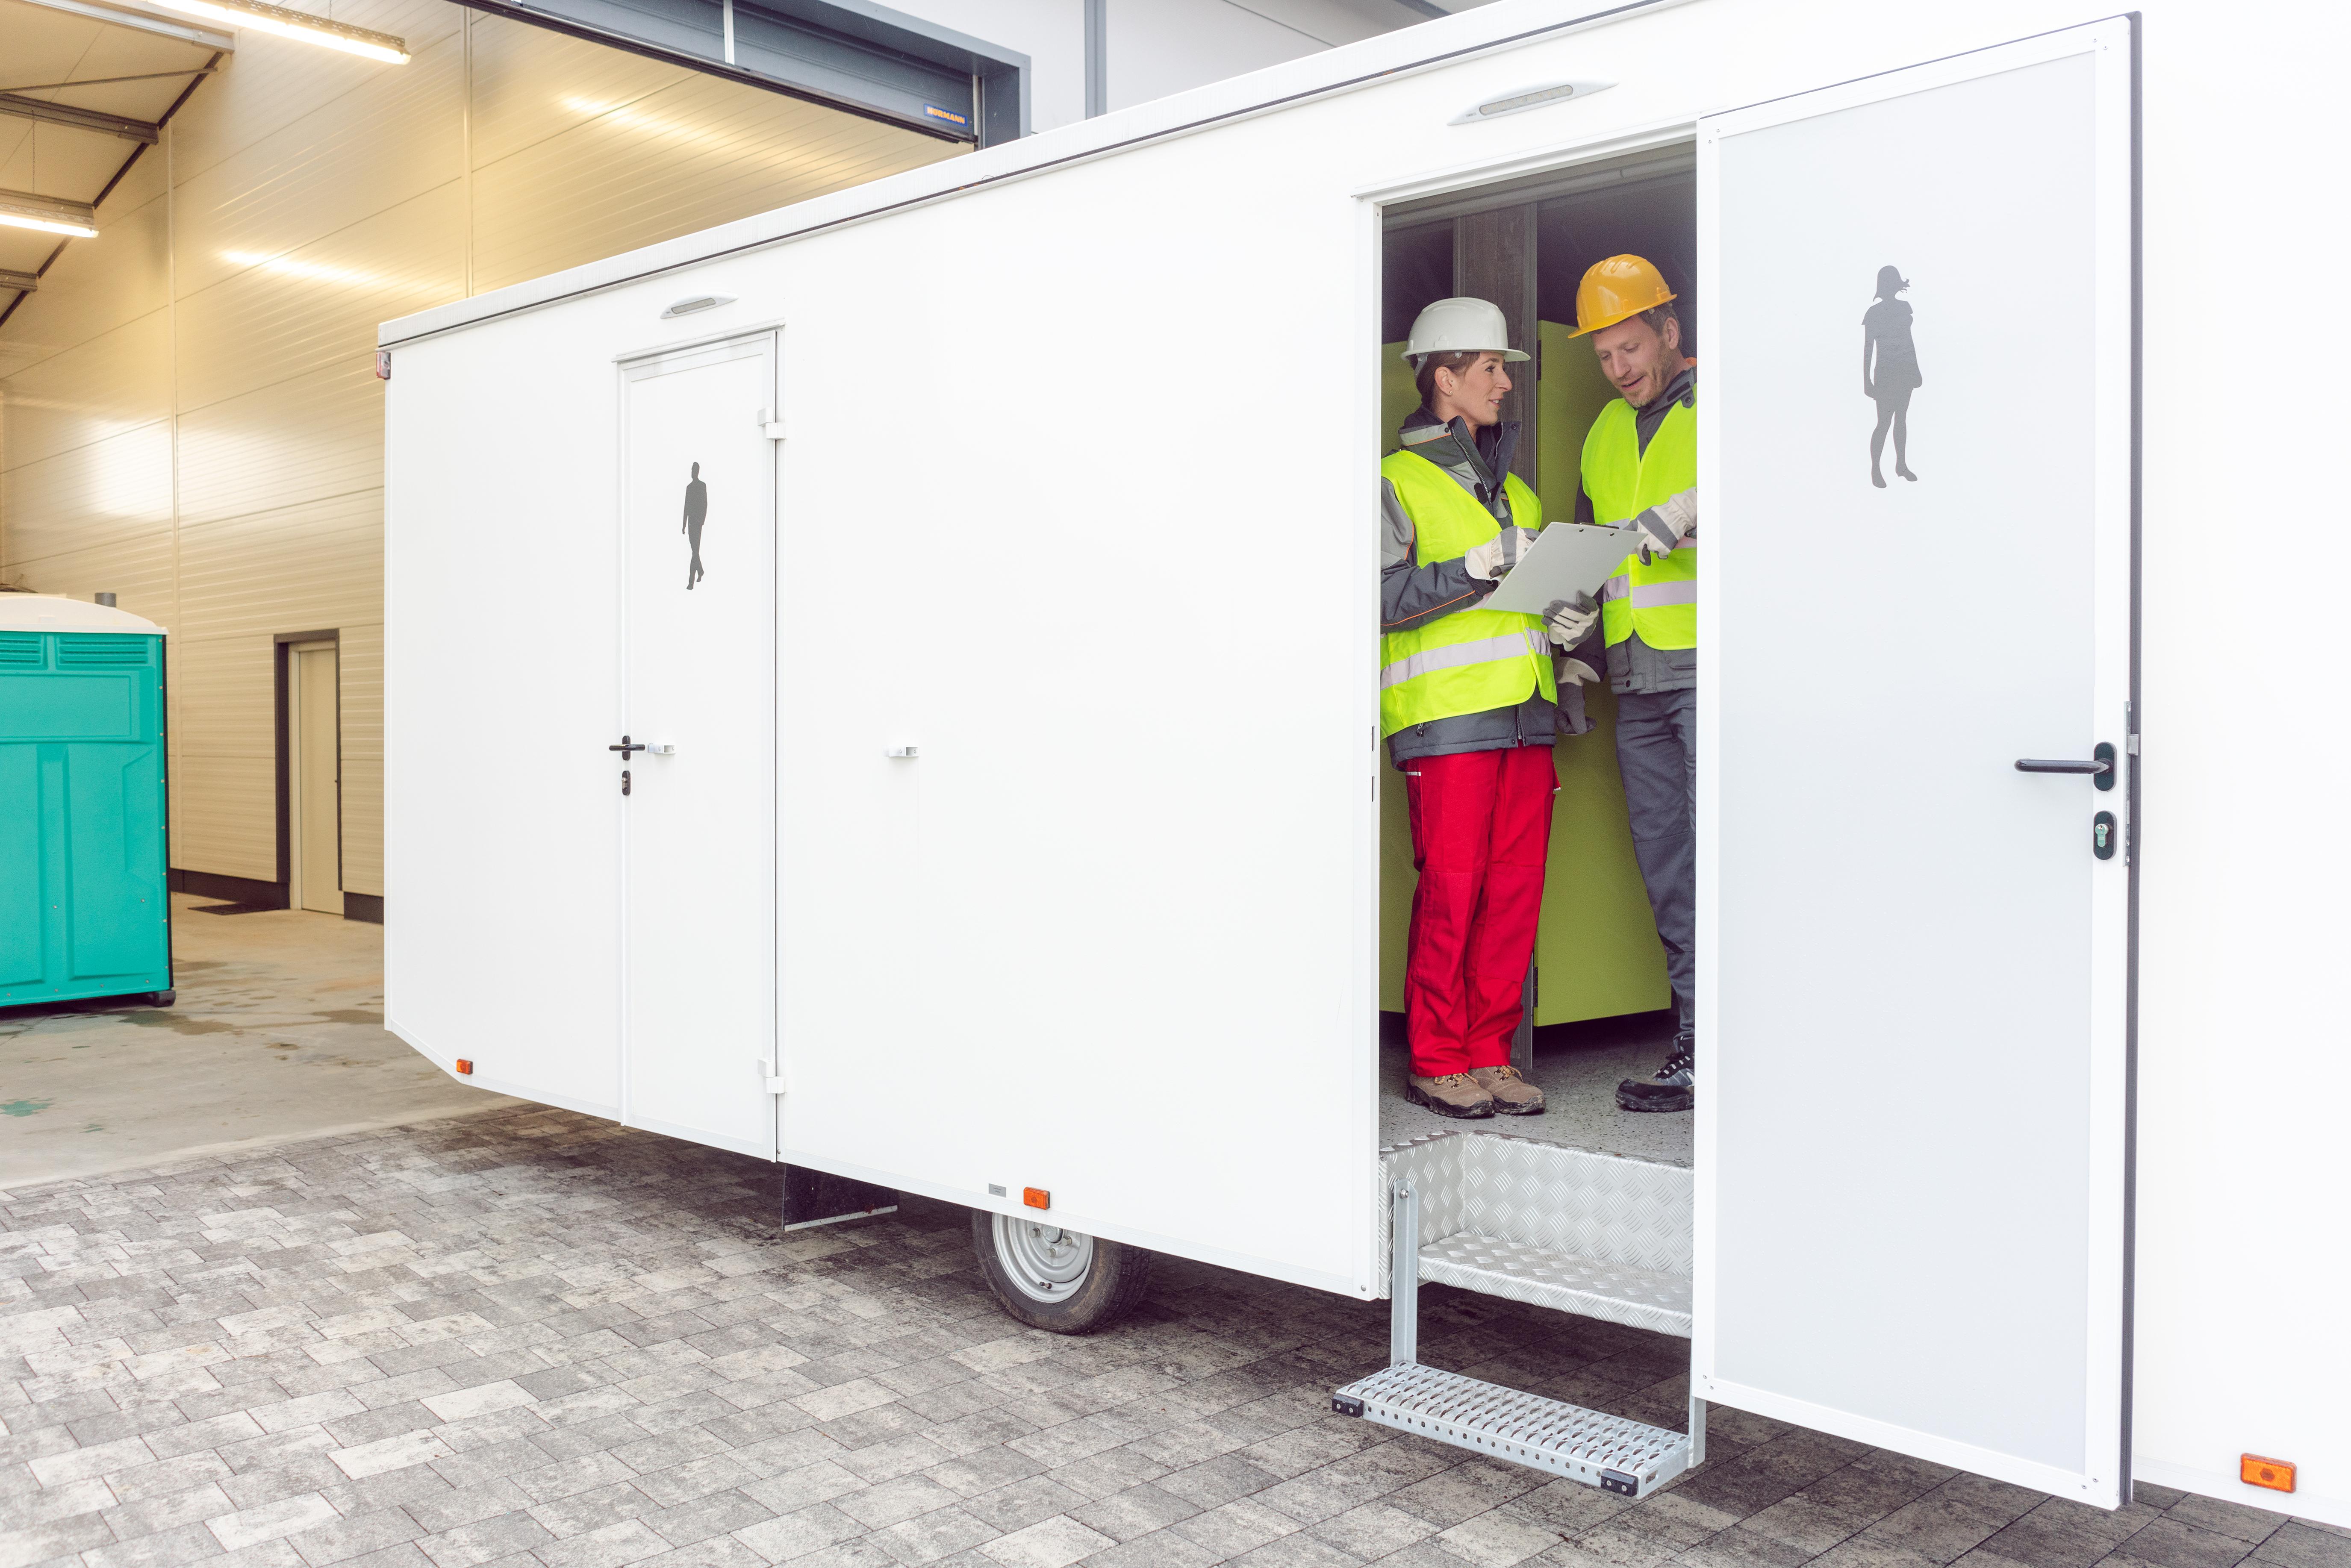 Portable restroom trailer for events